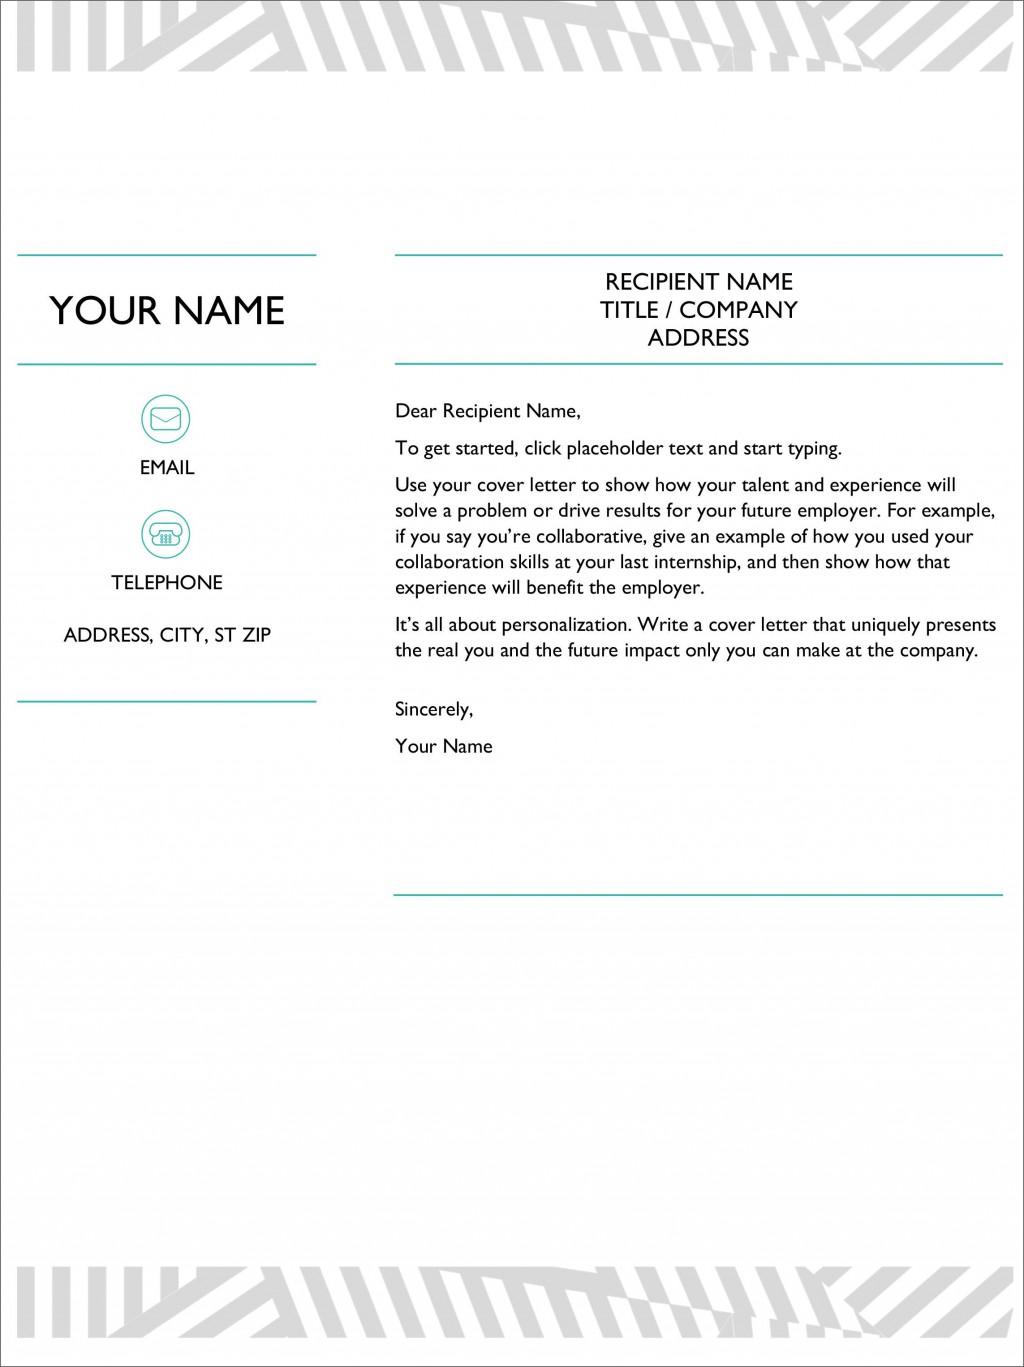 005 Impressive Google Doc Cover Letter Template Inspiration  Swis Free RedditLarge